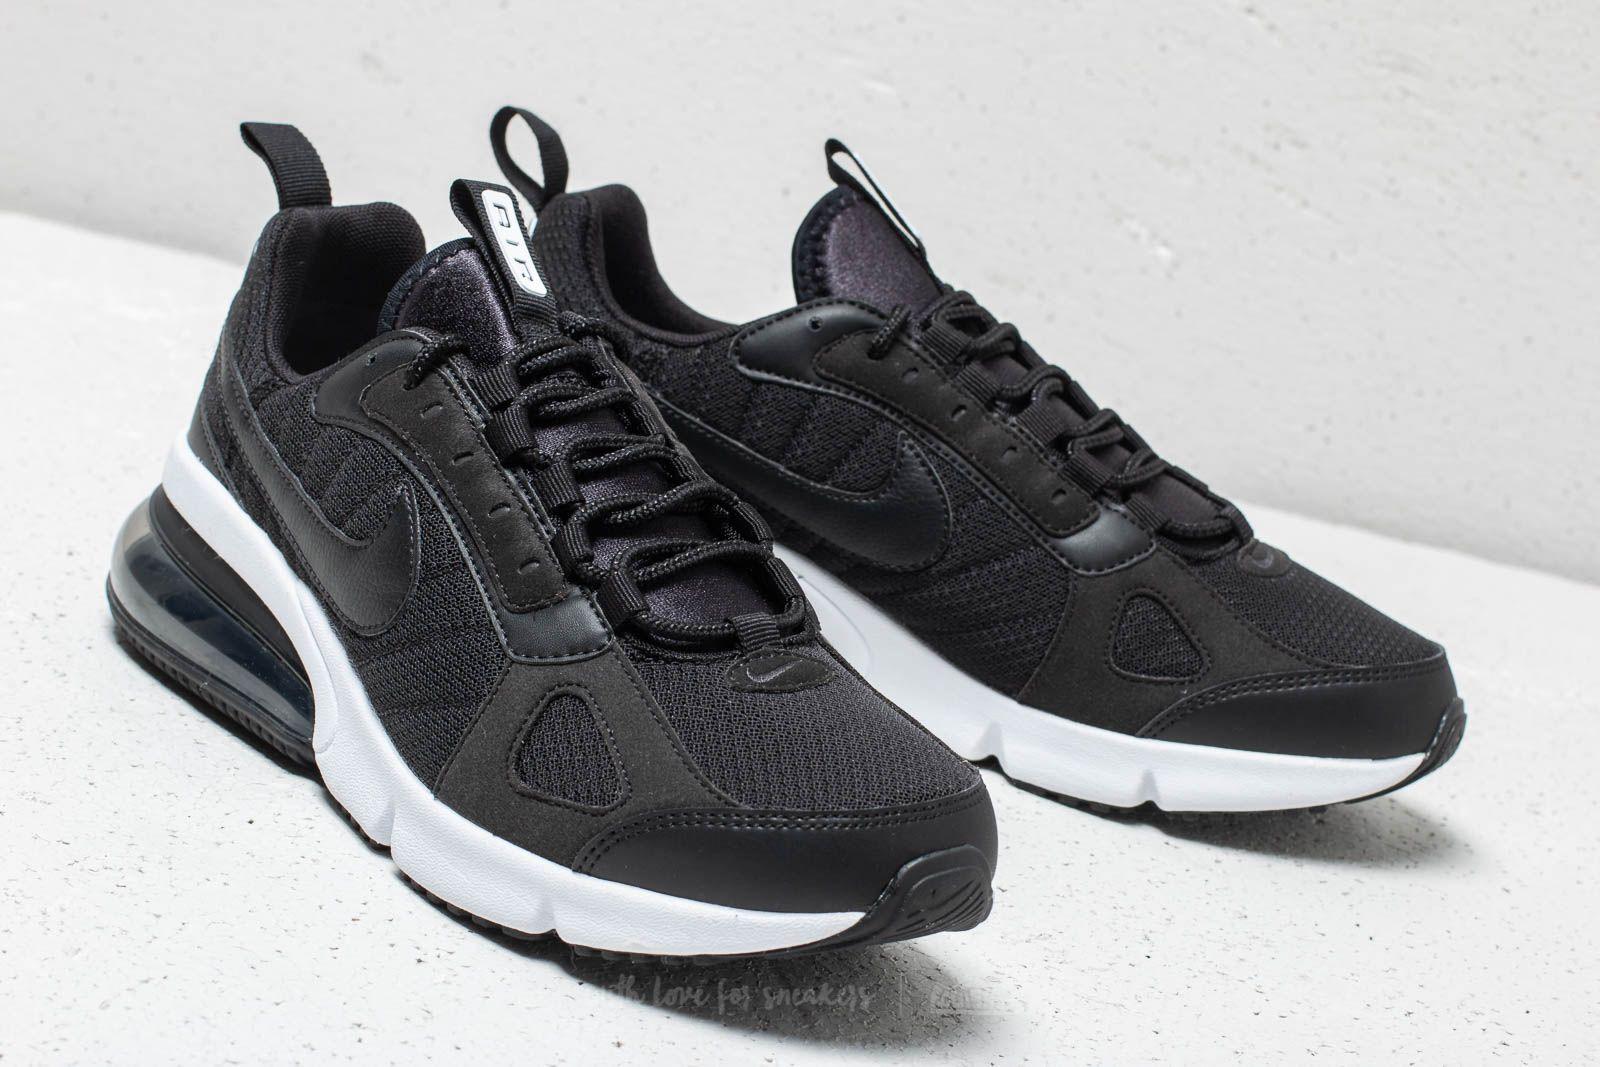 Nike Air Max 270 Futura Black  Black-White at a great price 139 € c288cccf5a